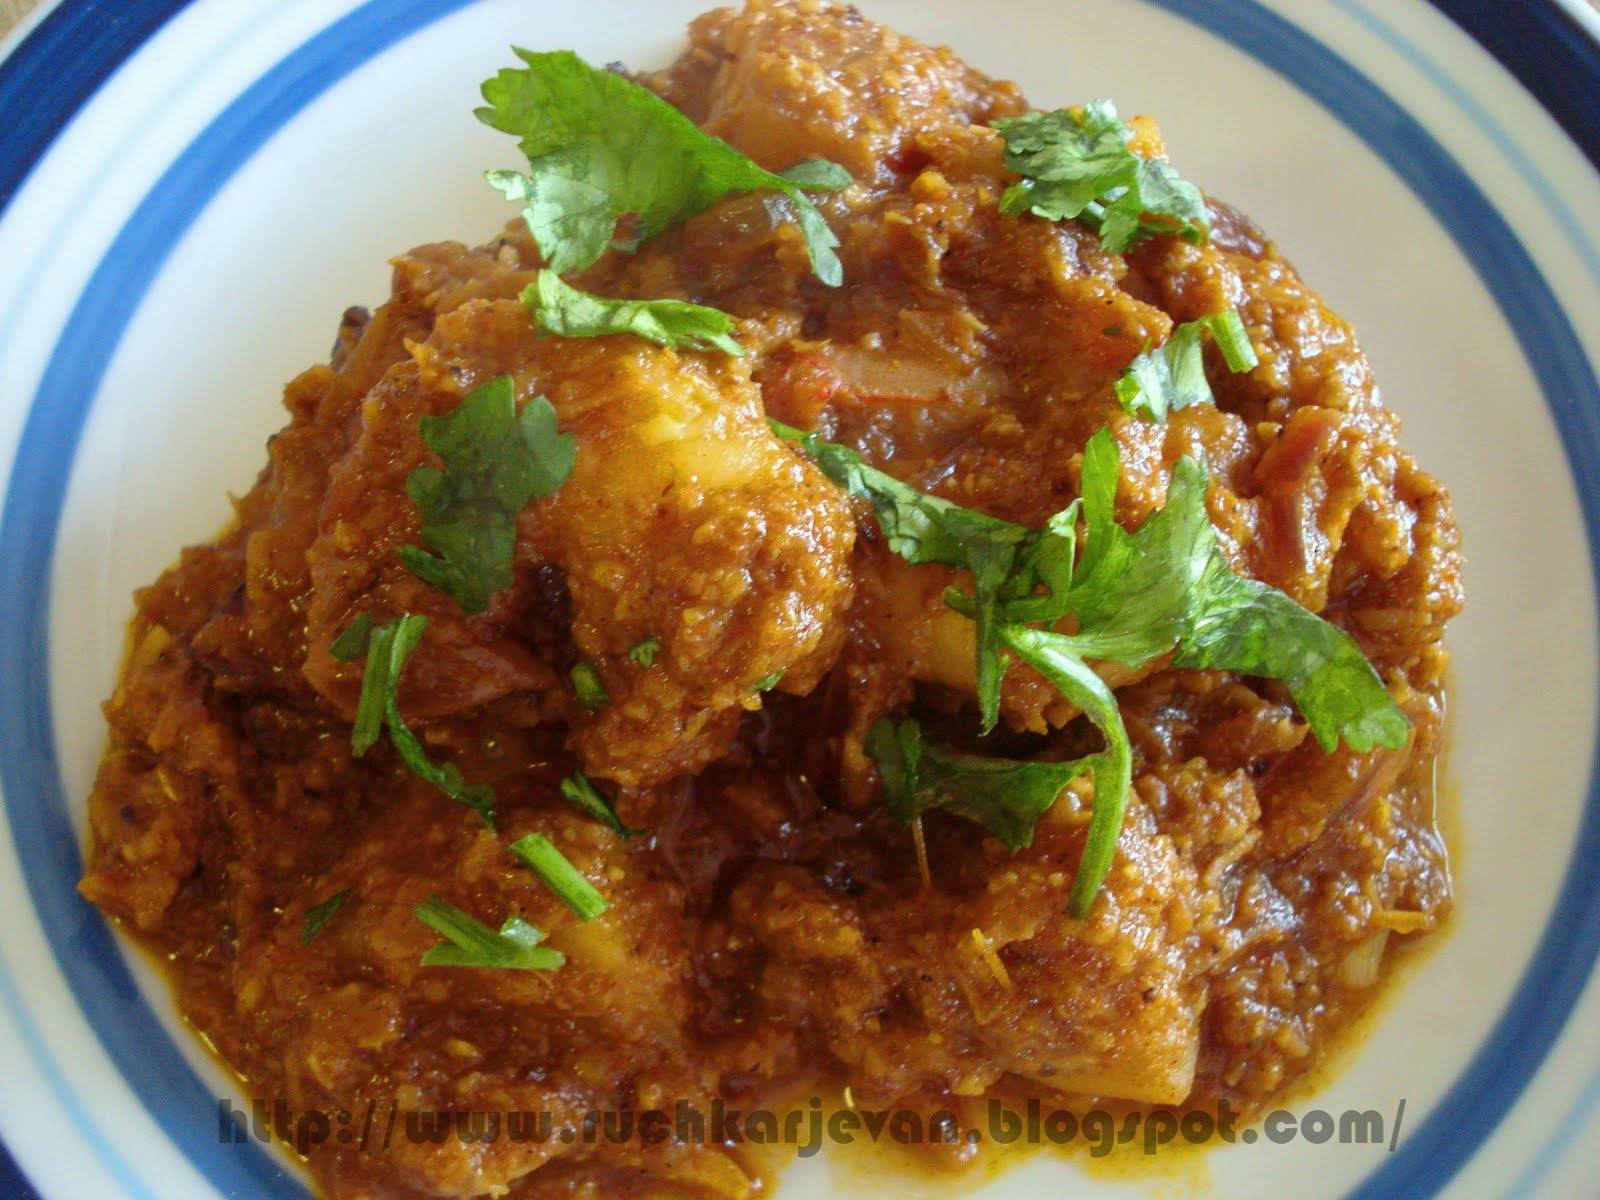 malvani prawn masala malvani prawn masala read this recipe in marathi forumfinder Choice Image